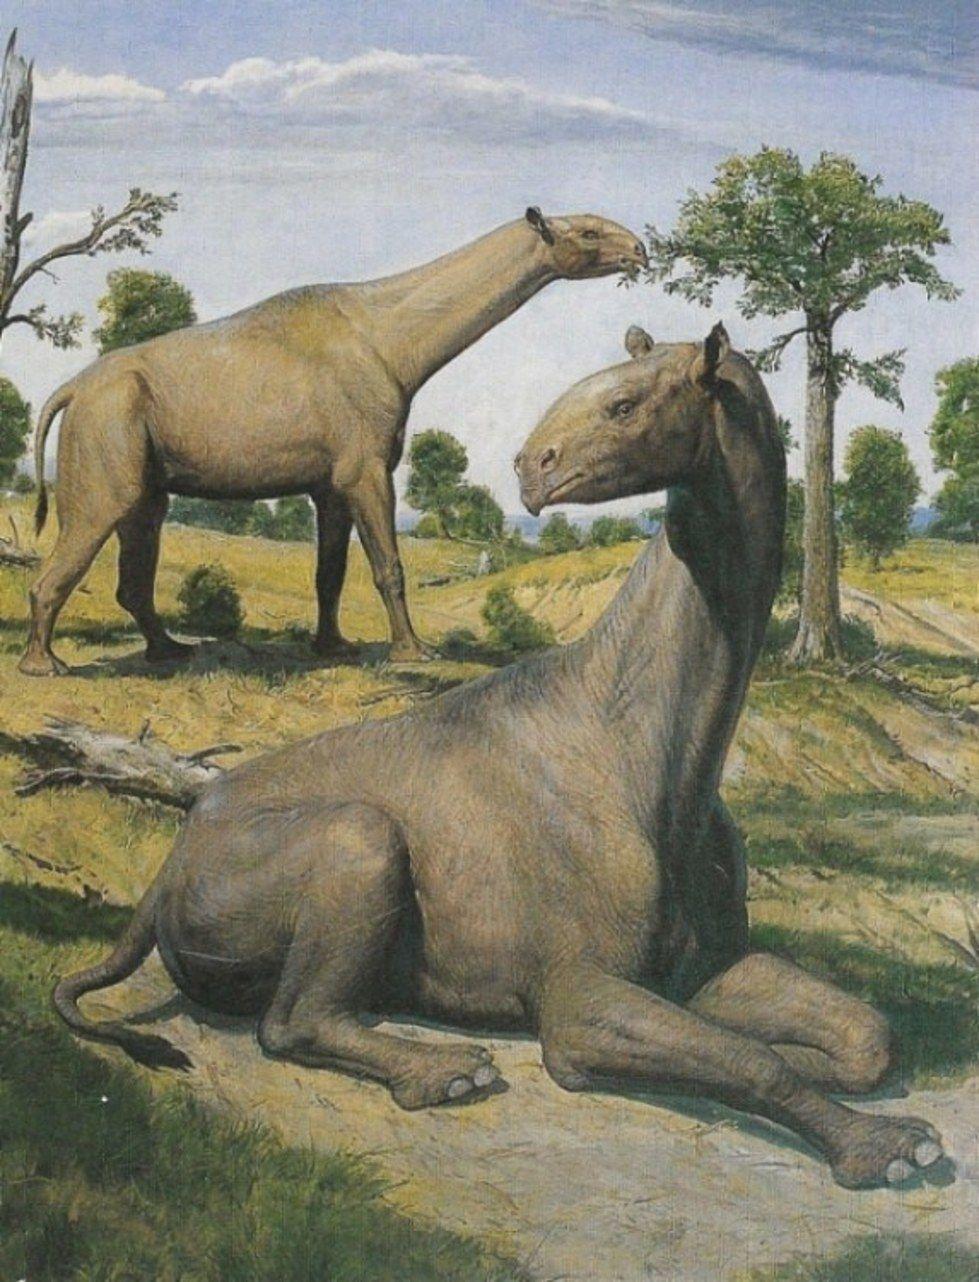 10 Ultra Cool Megafauna Giants #prehistoriccreatures